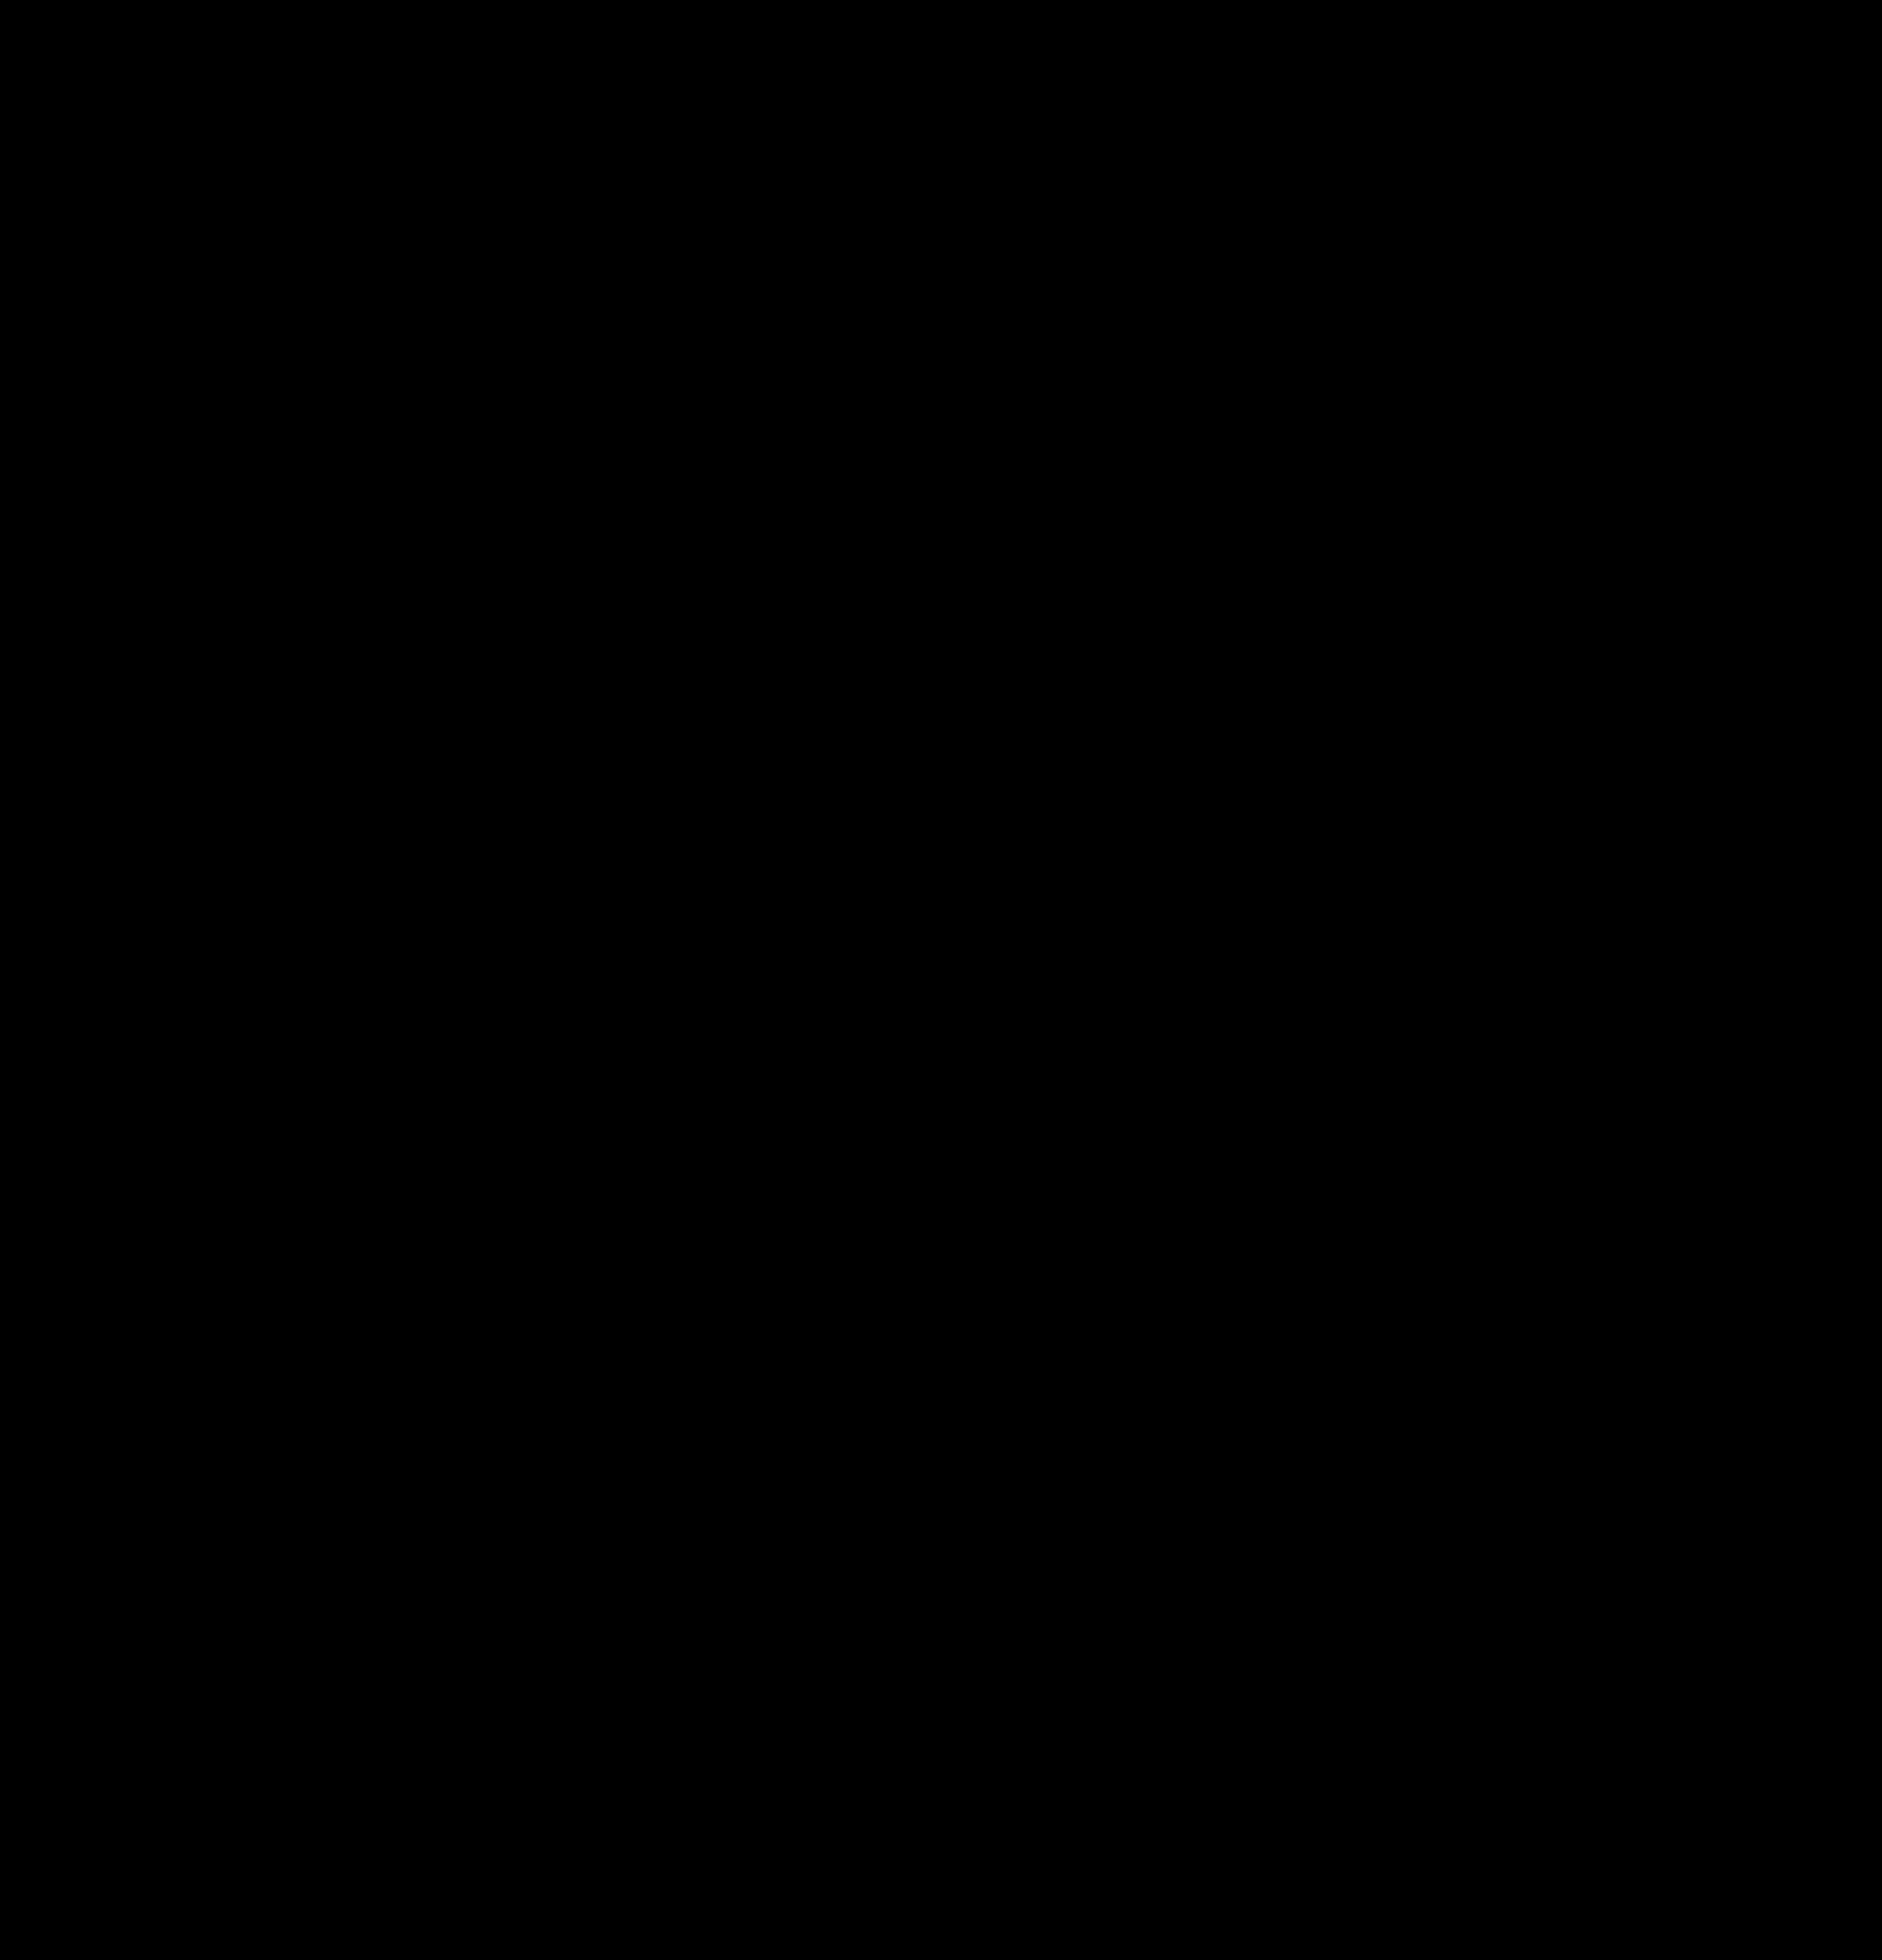 graphic black and white stock Maverick Softwares